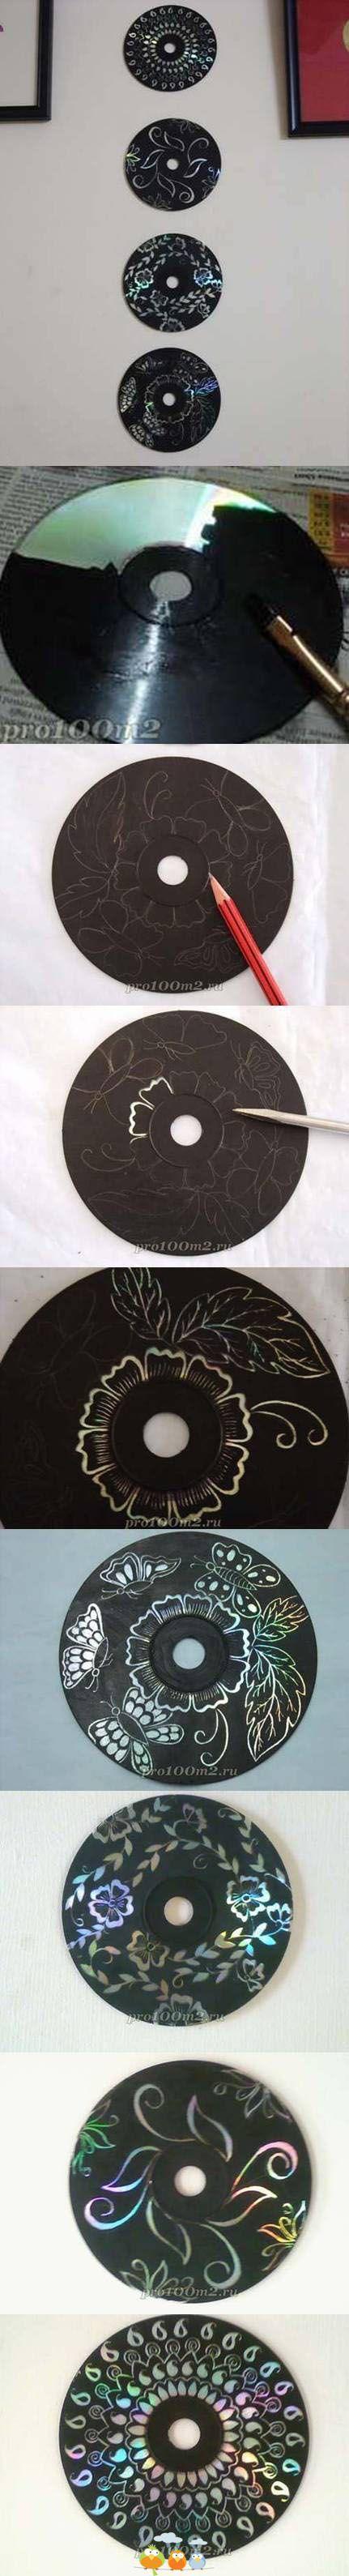 Riciclo cd rom 7